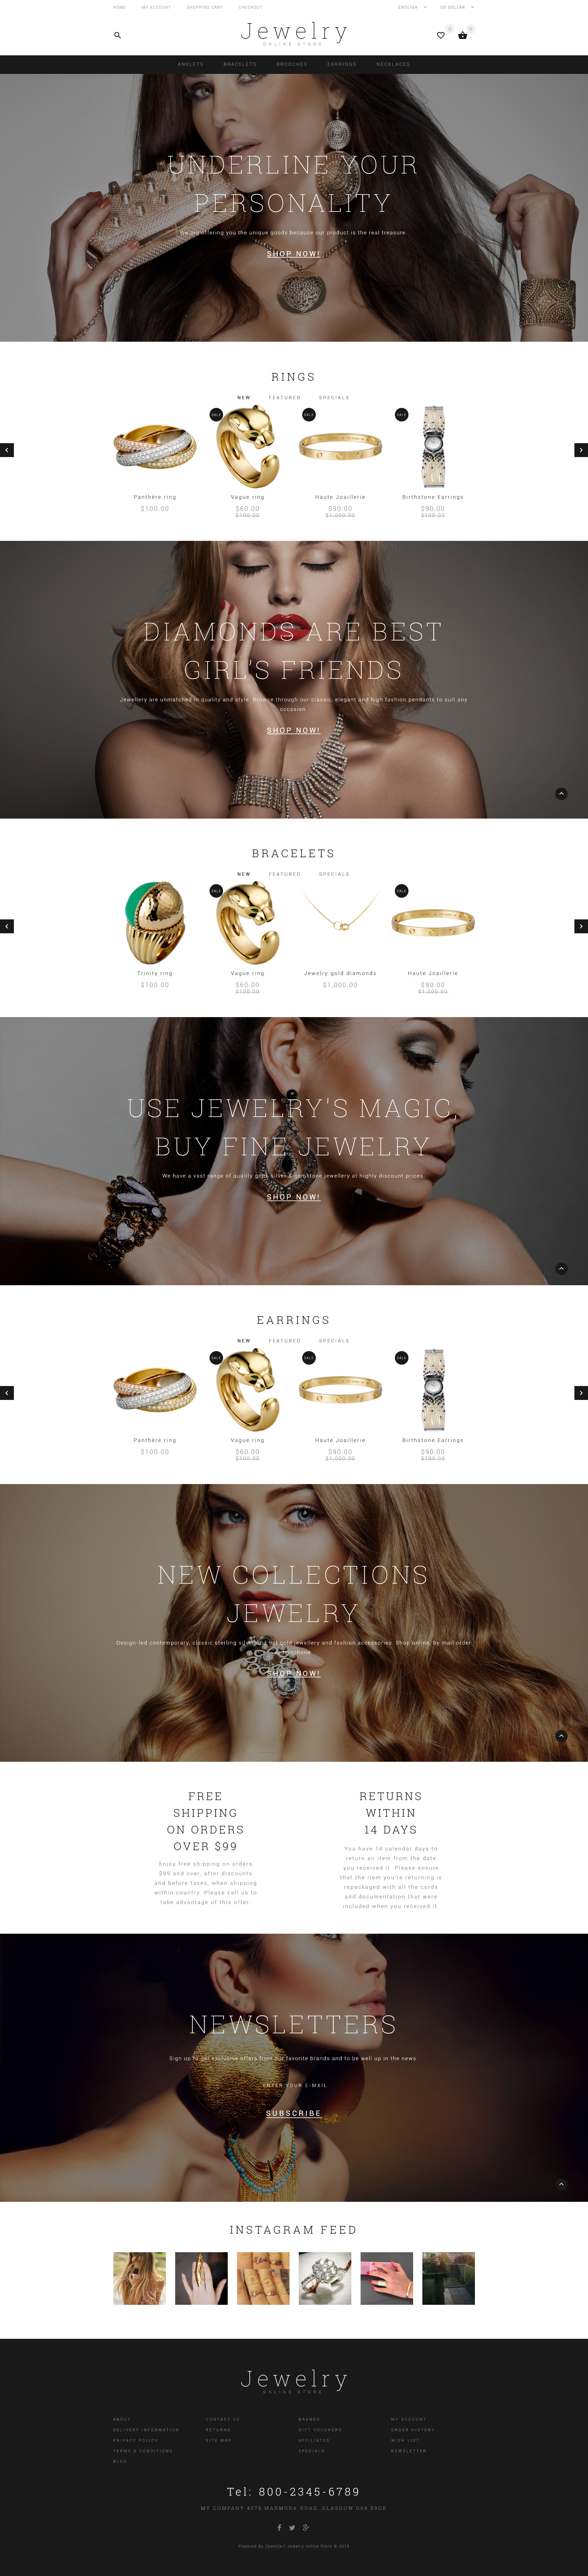 Jewelry Showcase OpenCart Template - screenshot